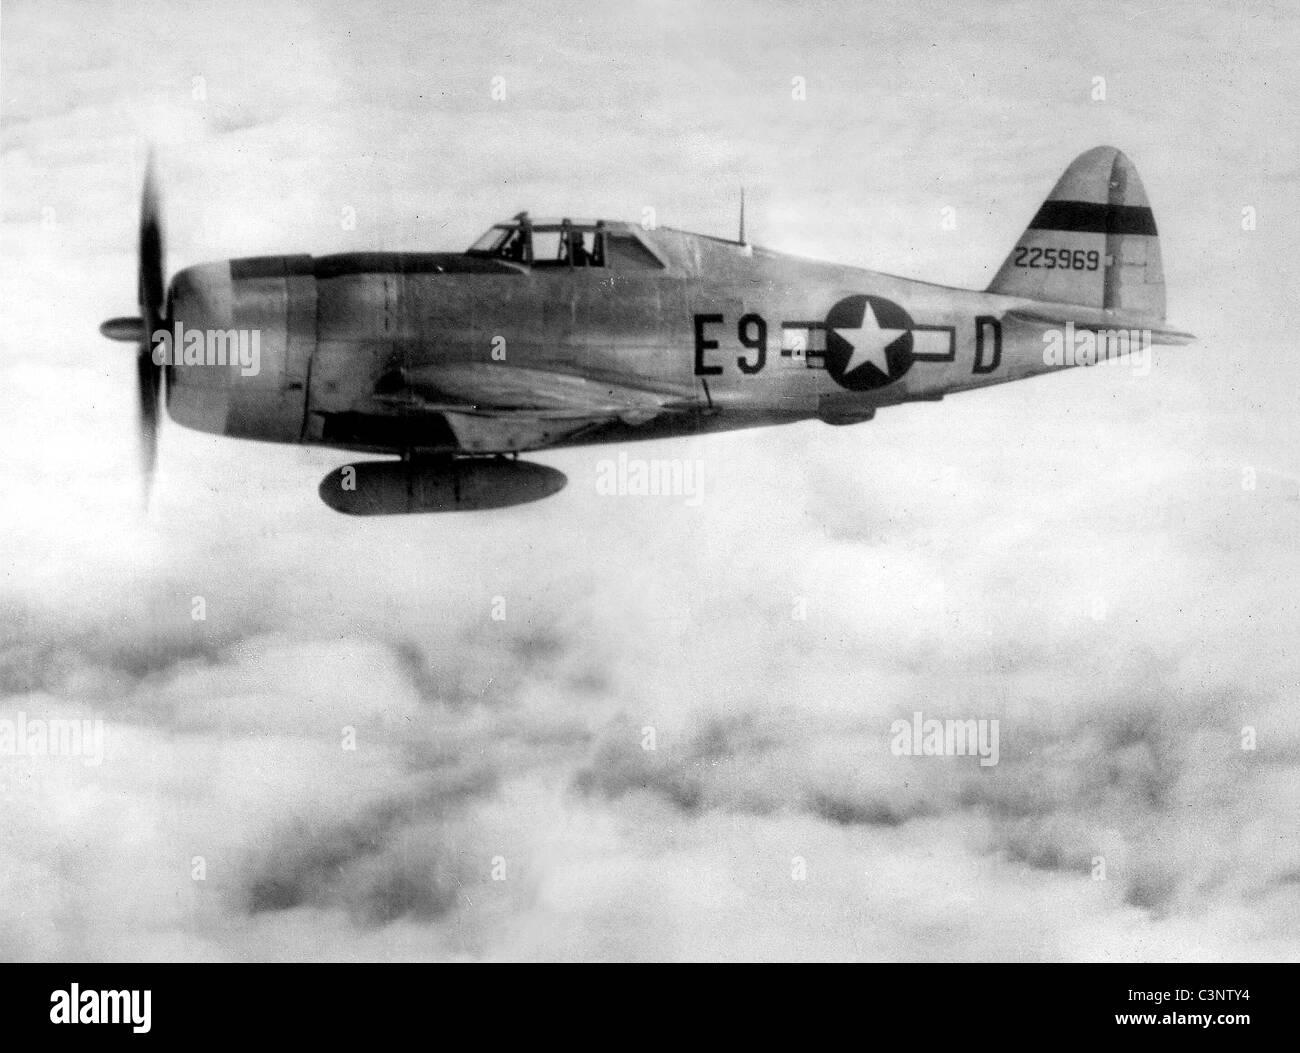 Republic Aviation P-47 Thunderbolt aircraft - Stock Image